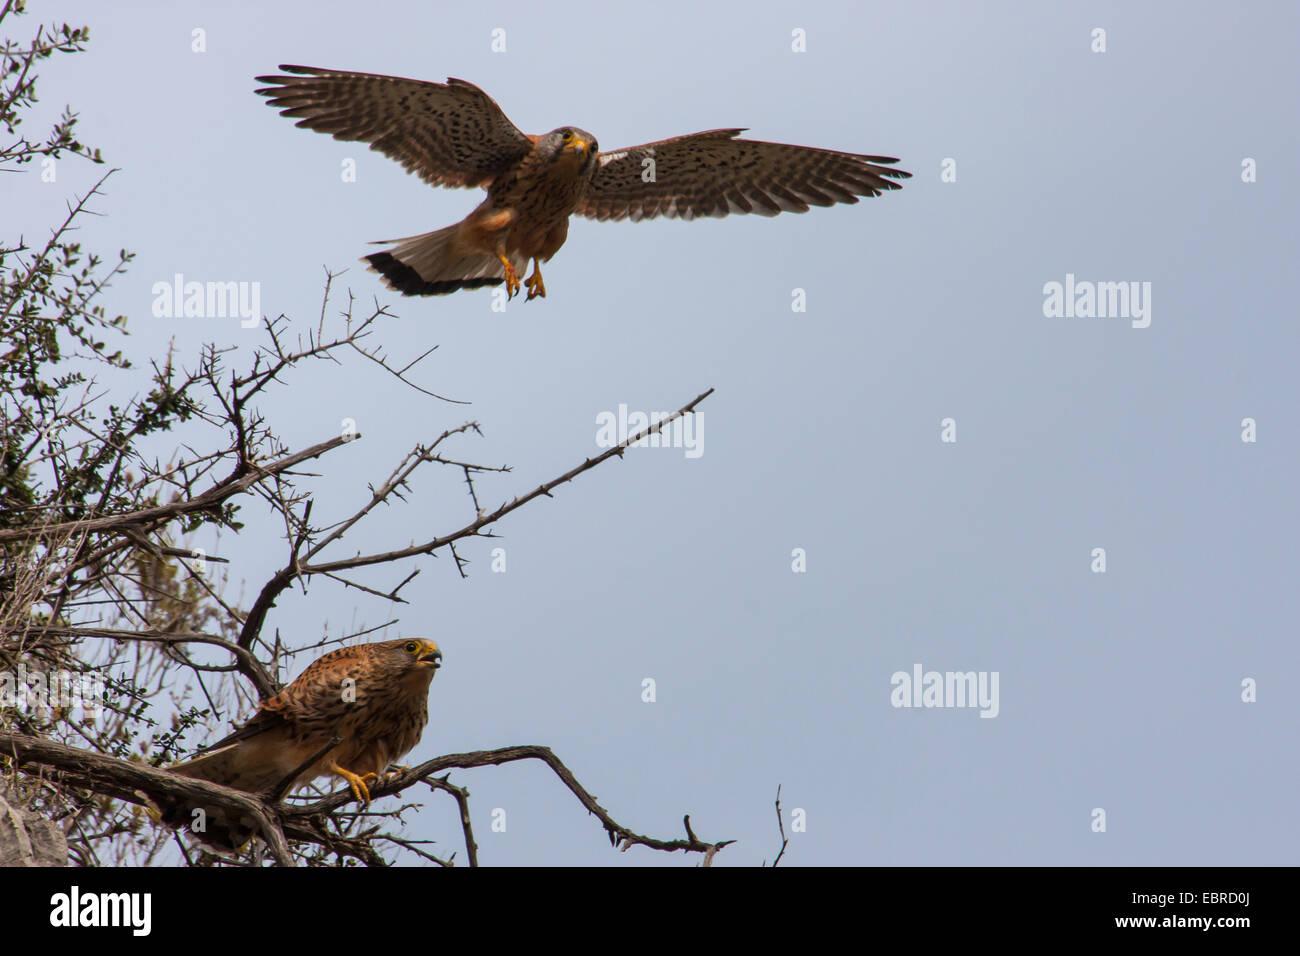 European Kestrel, Eurasian Kestrel, Old World Kestrel, Common Kestrel (Falco tinnunculus), couple at its outlook, - Stock Image